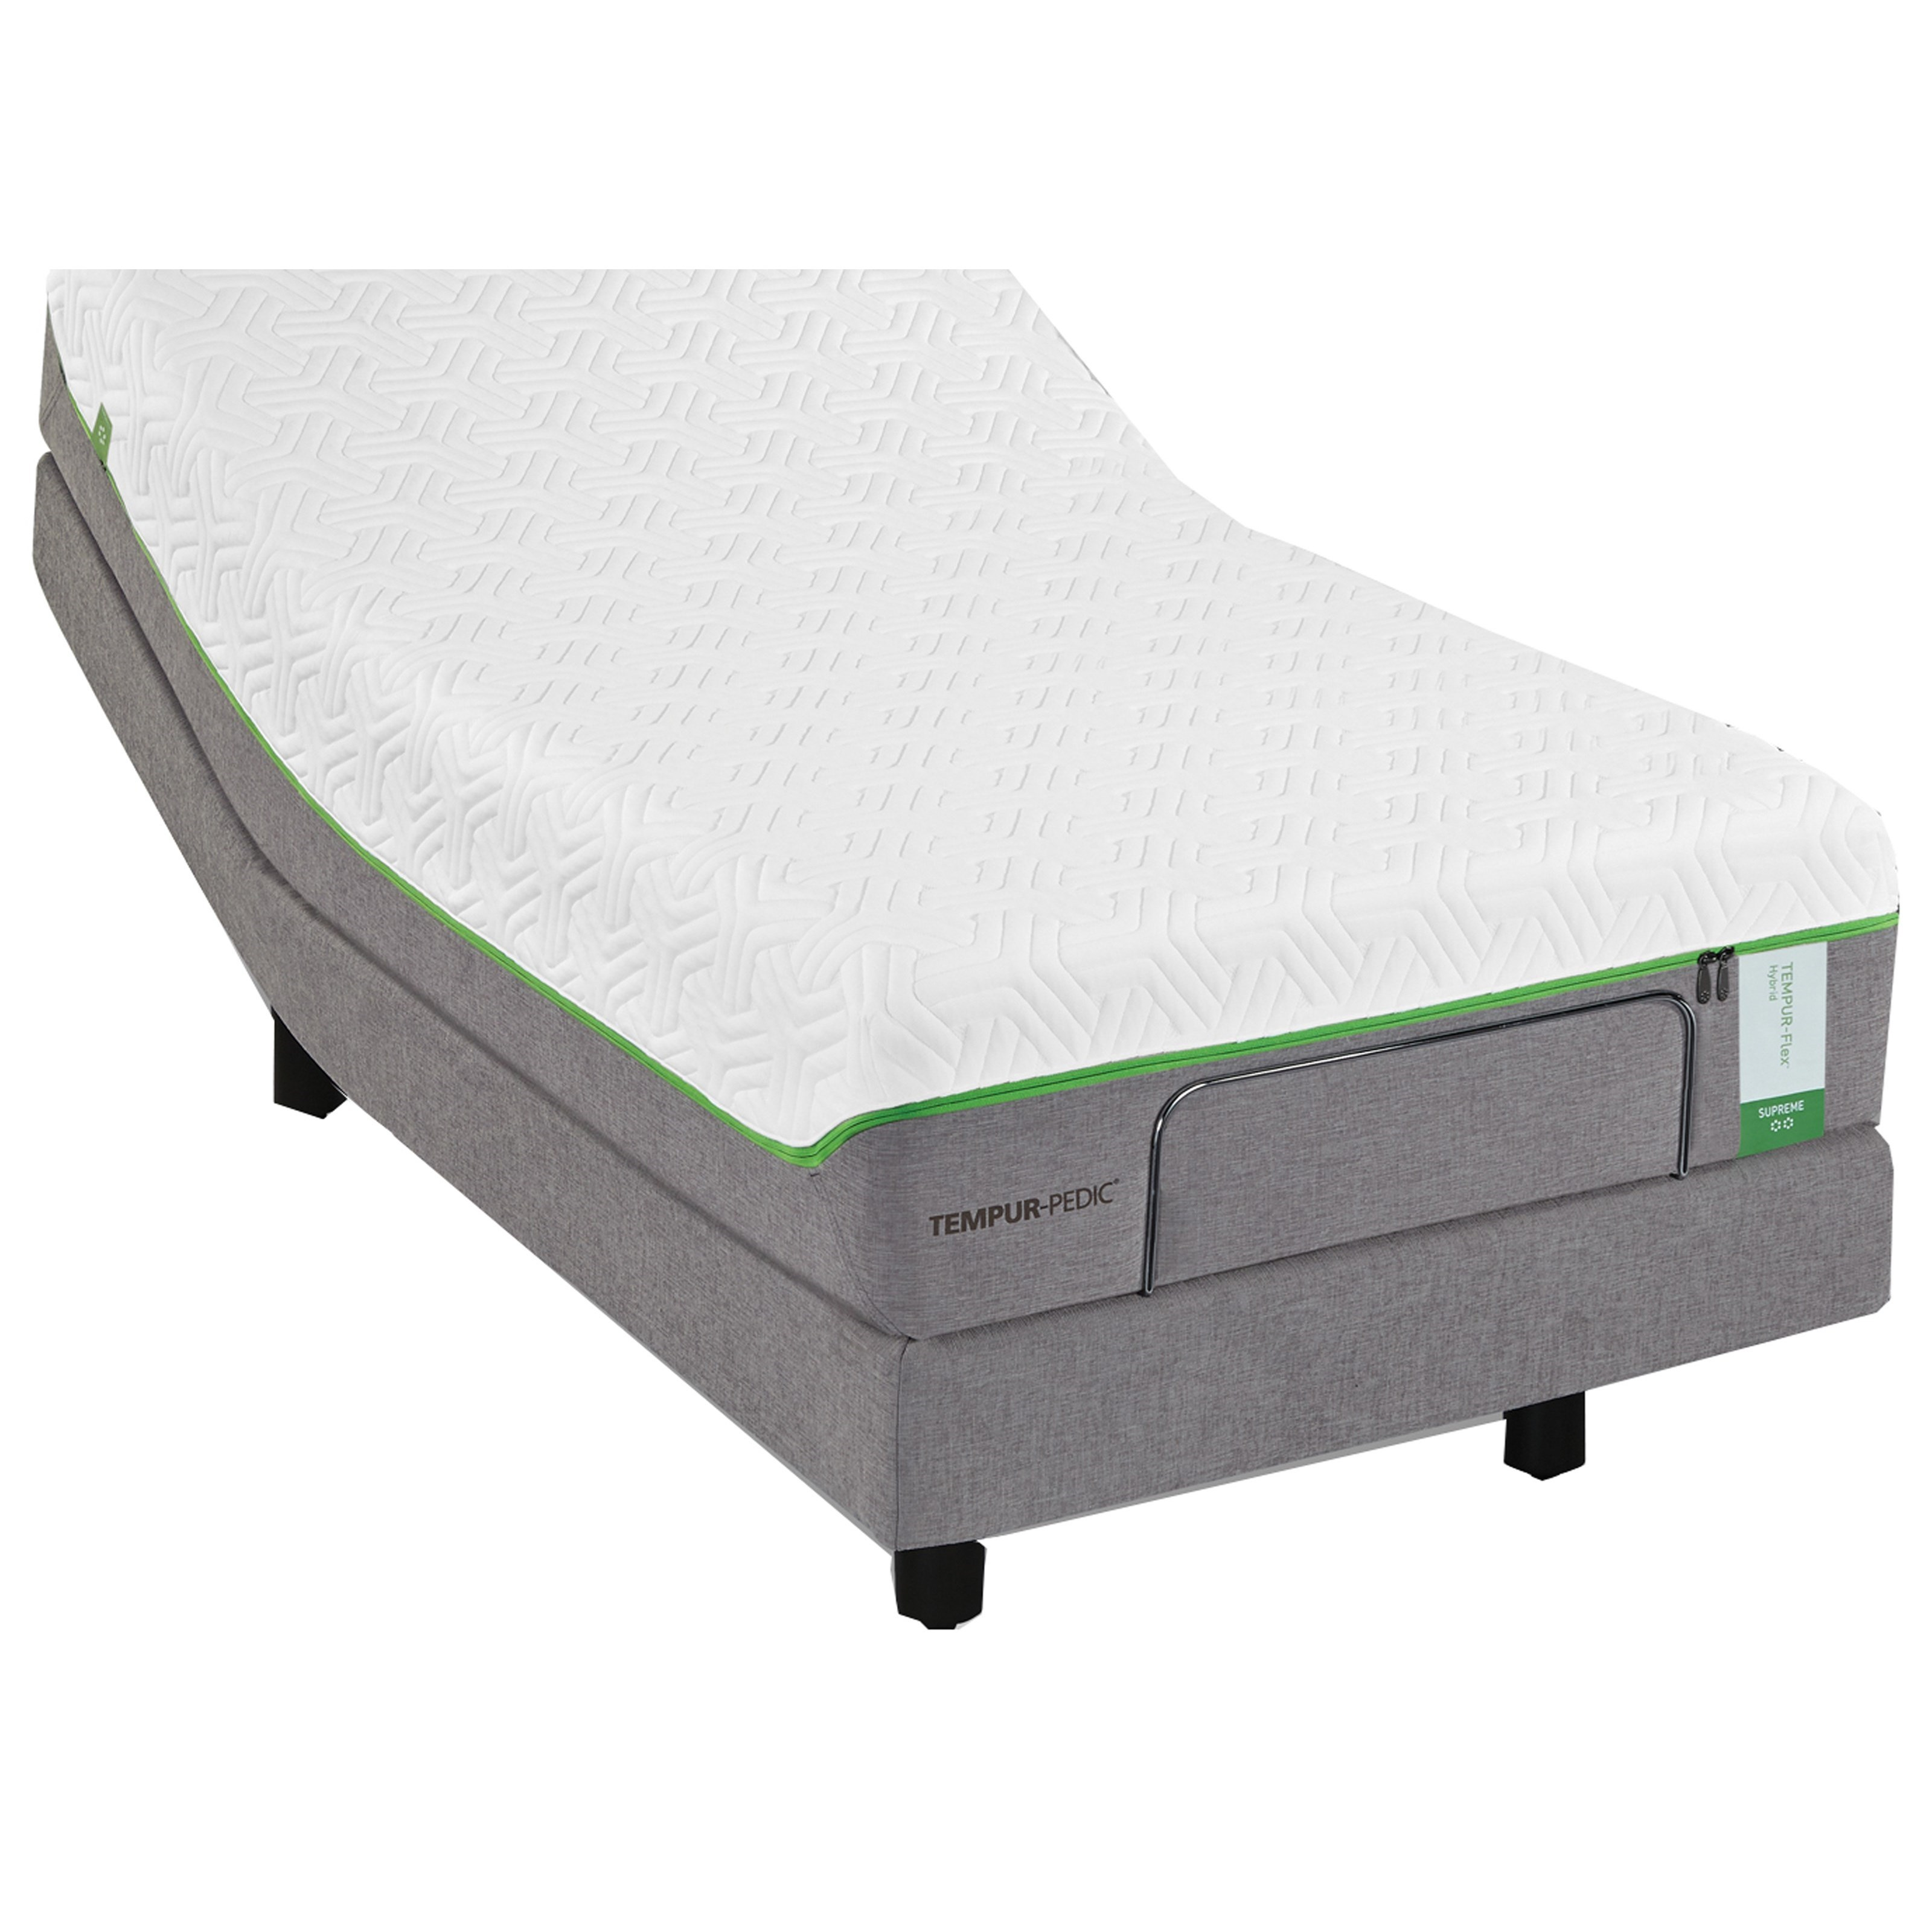 Tempur-Pedic® TEMPUR-Flex Elite Twin XL Medium Soft Plush Mattress Set - Item Number: 10117120+25565220